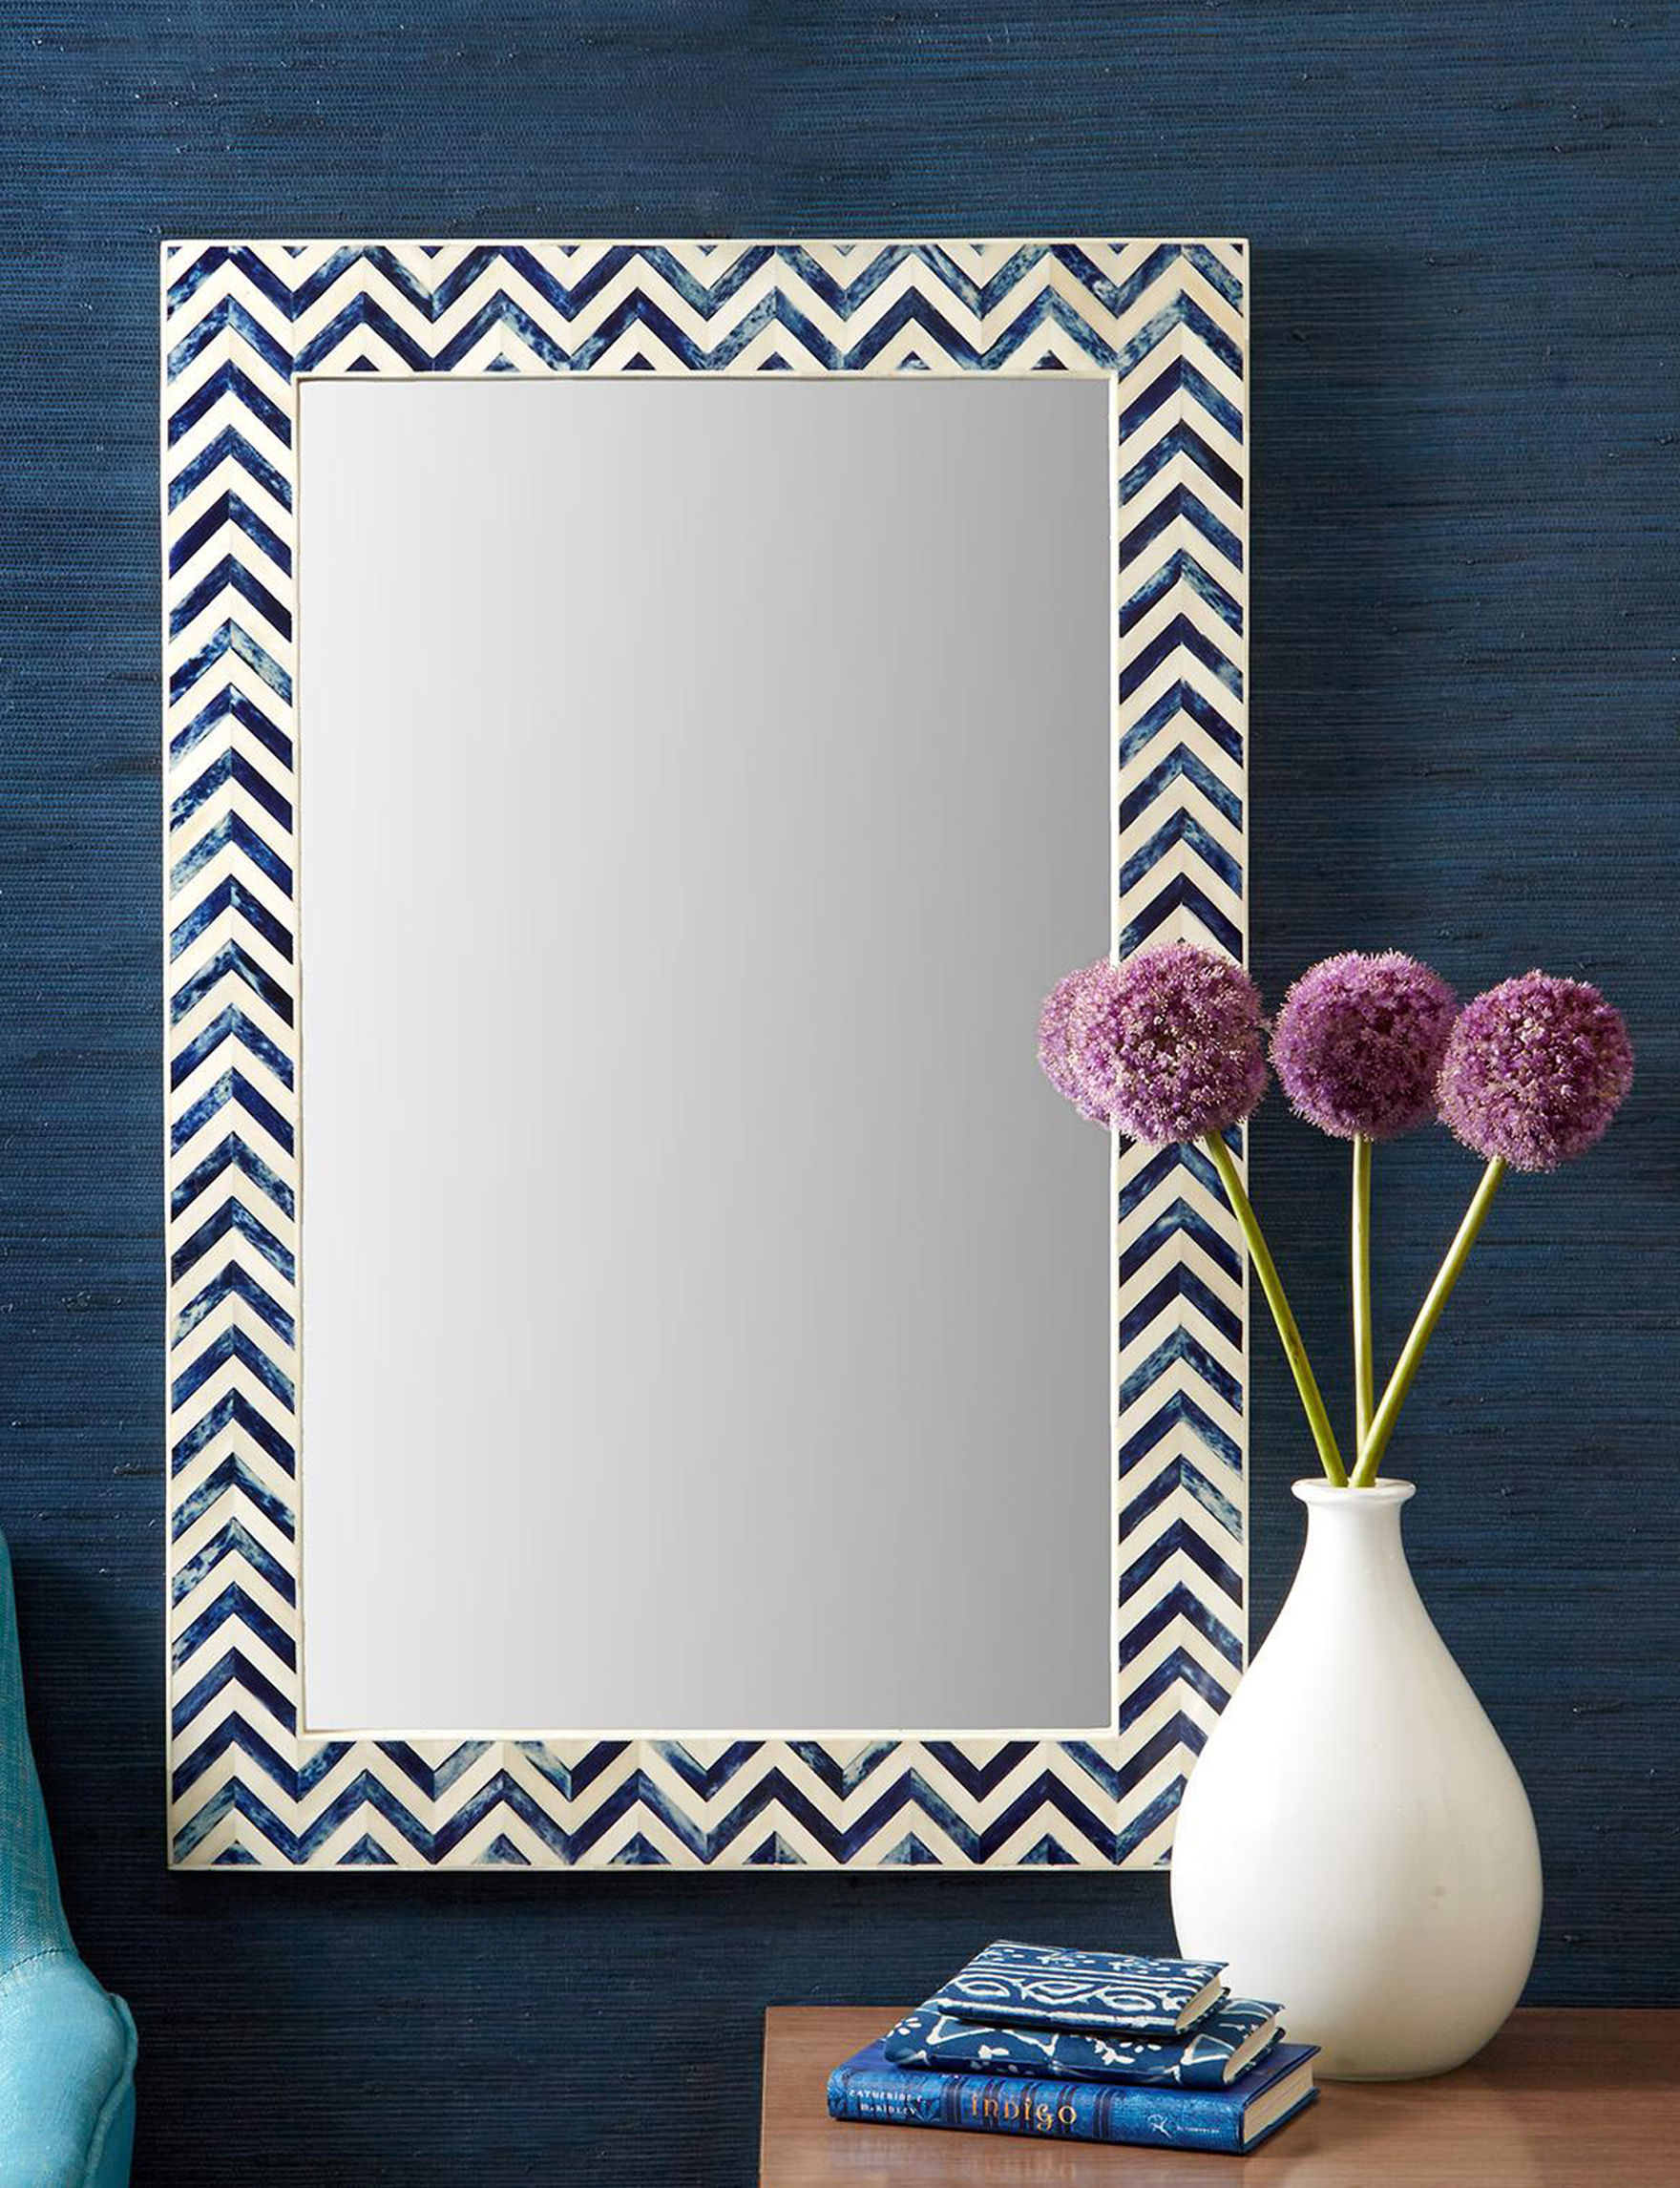 Two's Company Blue Mirrors Wall Decor